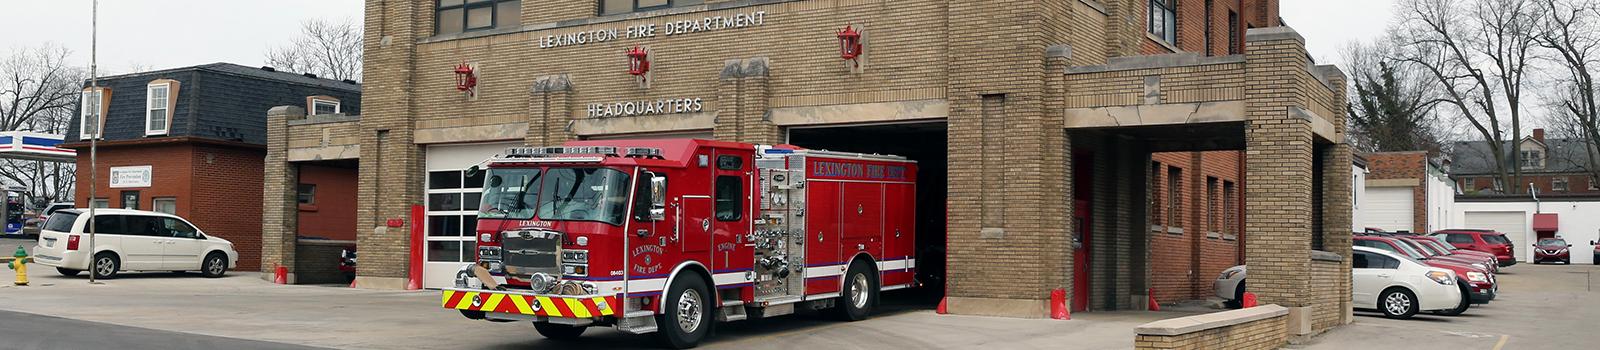 Fire Station locations   City of Lexington